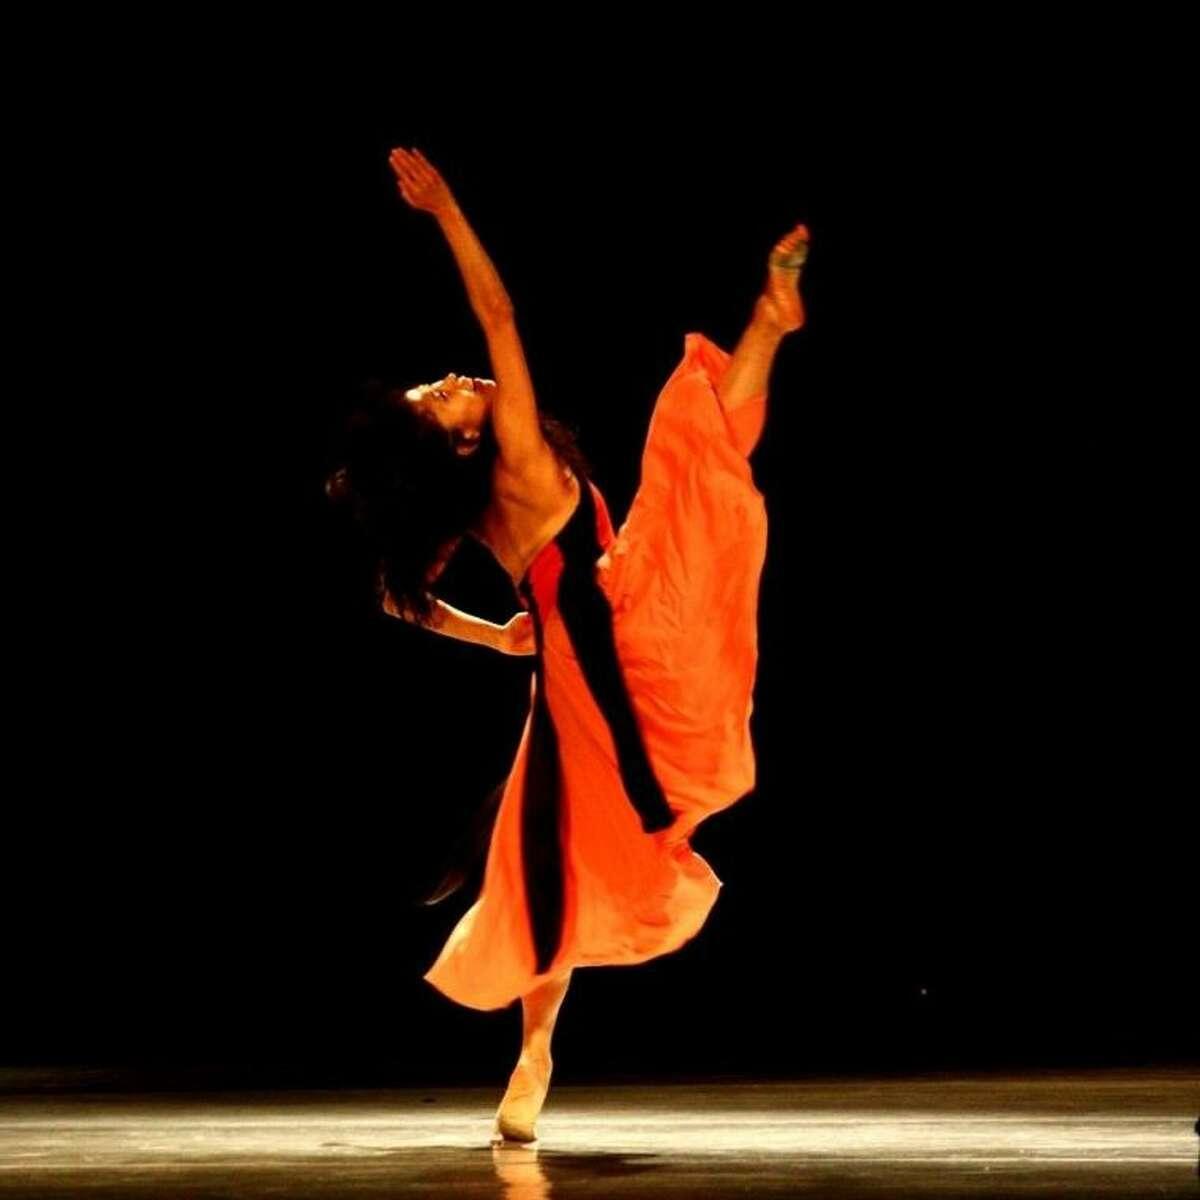 Shizu Yasuda performs a dance choreographed by Randall Flinn as part of Houston Choreographers X6 at the ERJCC January 25-26.